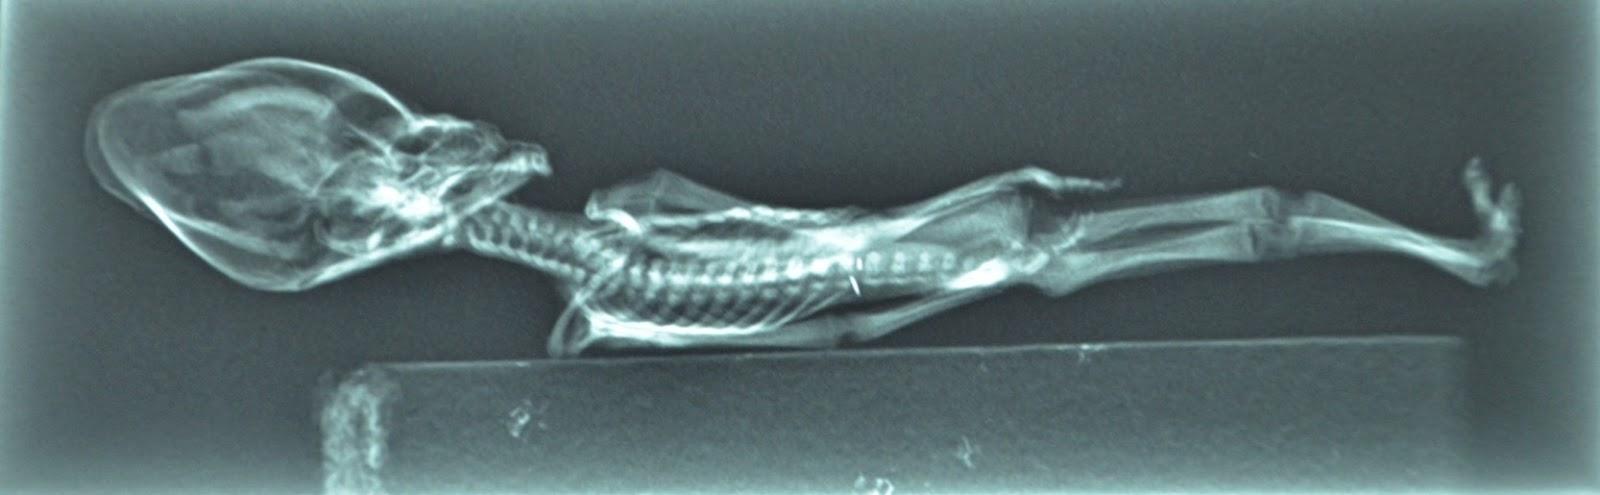 [Image: sirius-atacama-humanoid-alien-picture-x-ray.jpg]